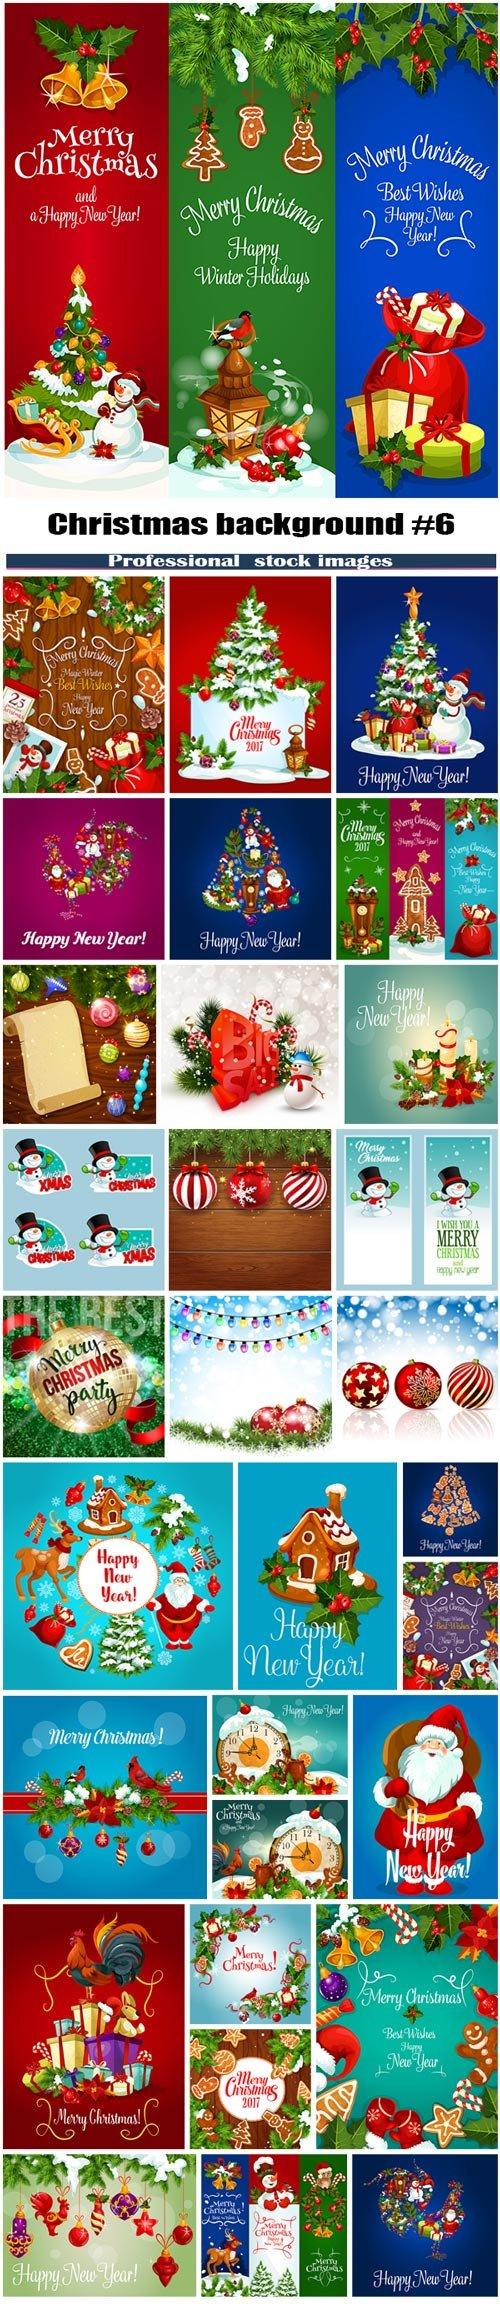 Christmas background #6